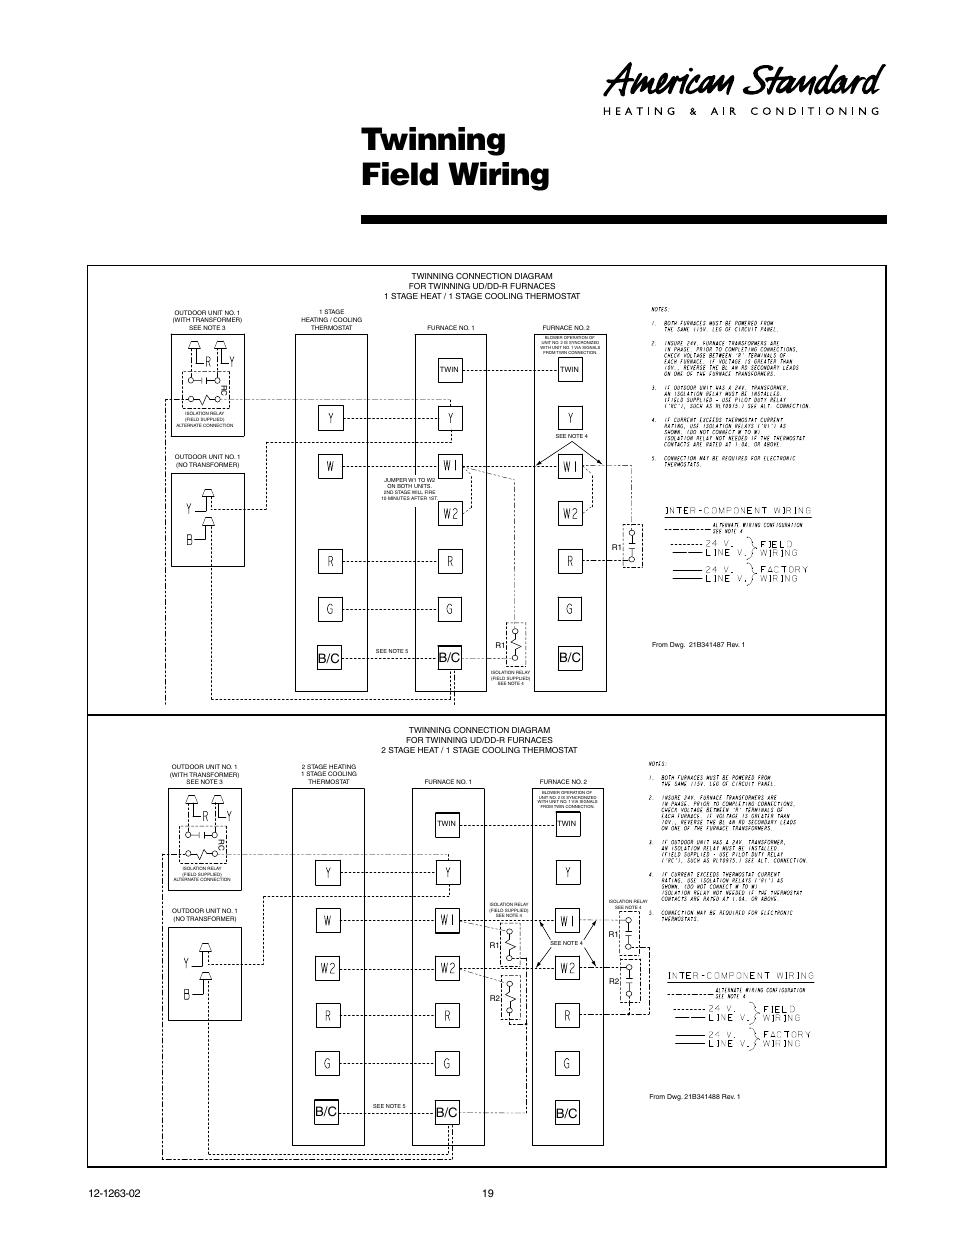 Twin Furnace Wiring Diagram Auto Electrical Twinning Furnaces